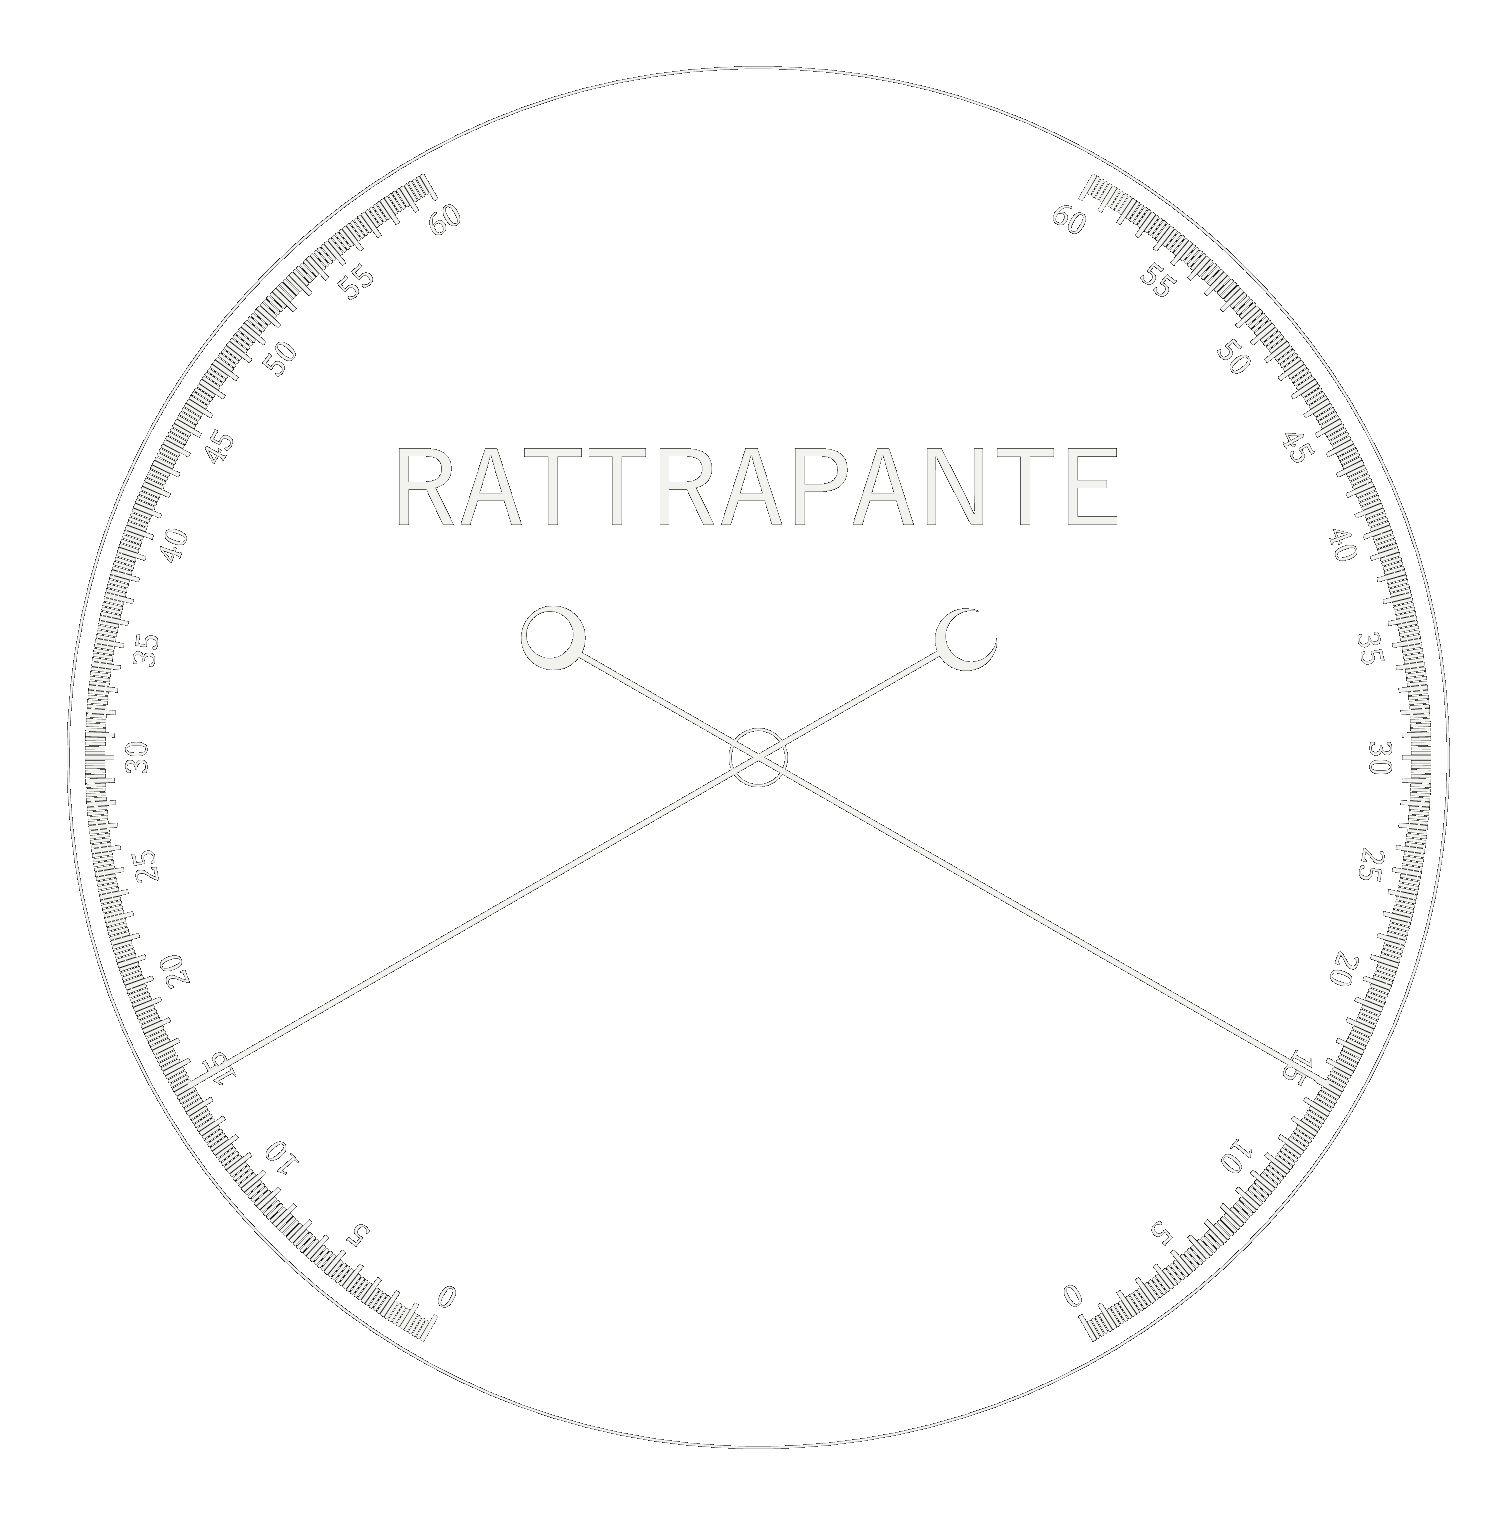 Rattrapante